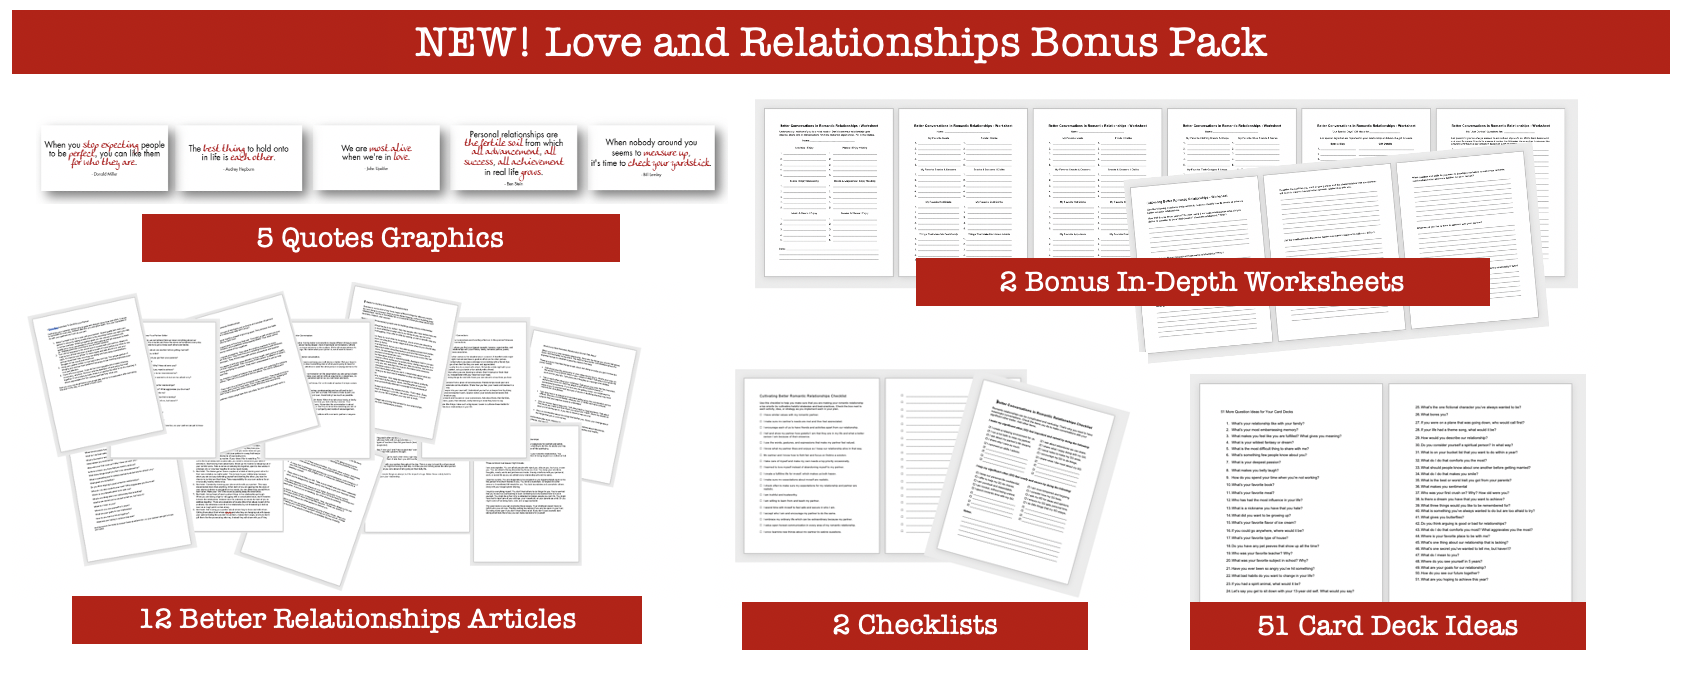 Love and Relationships Bonus Pack